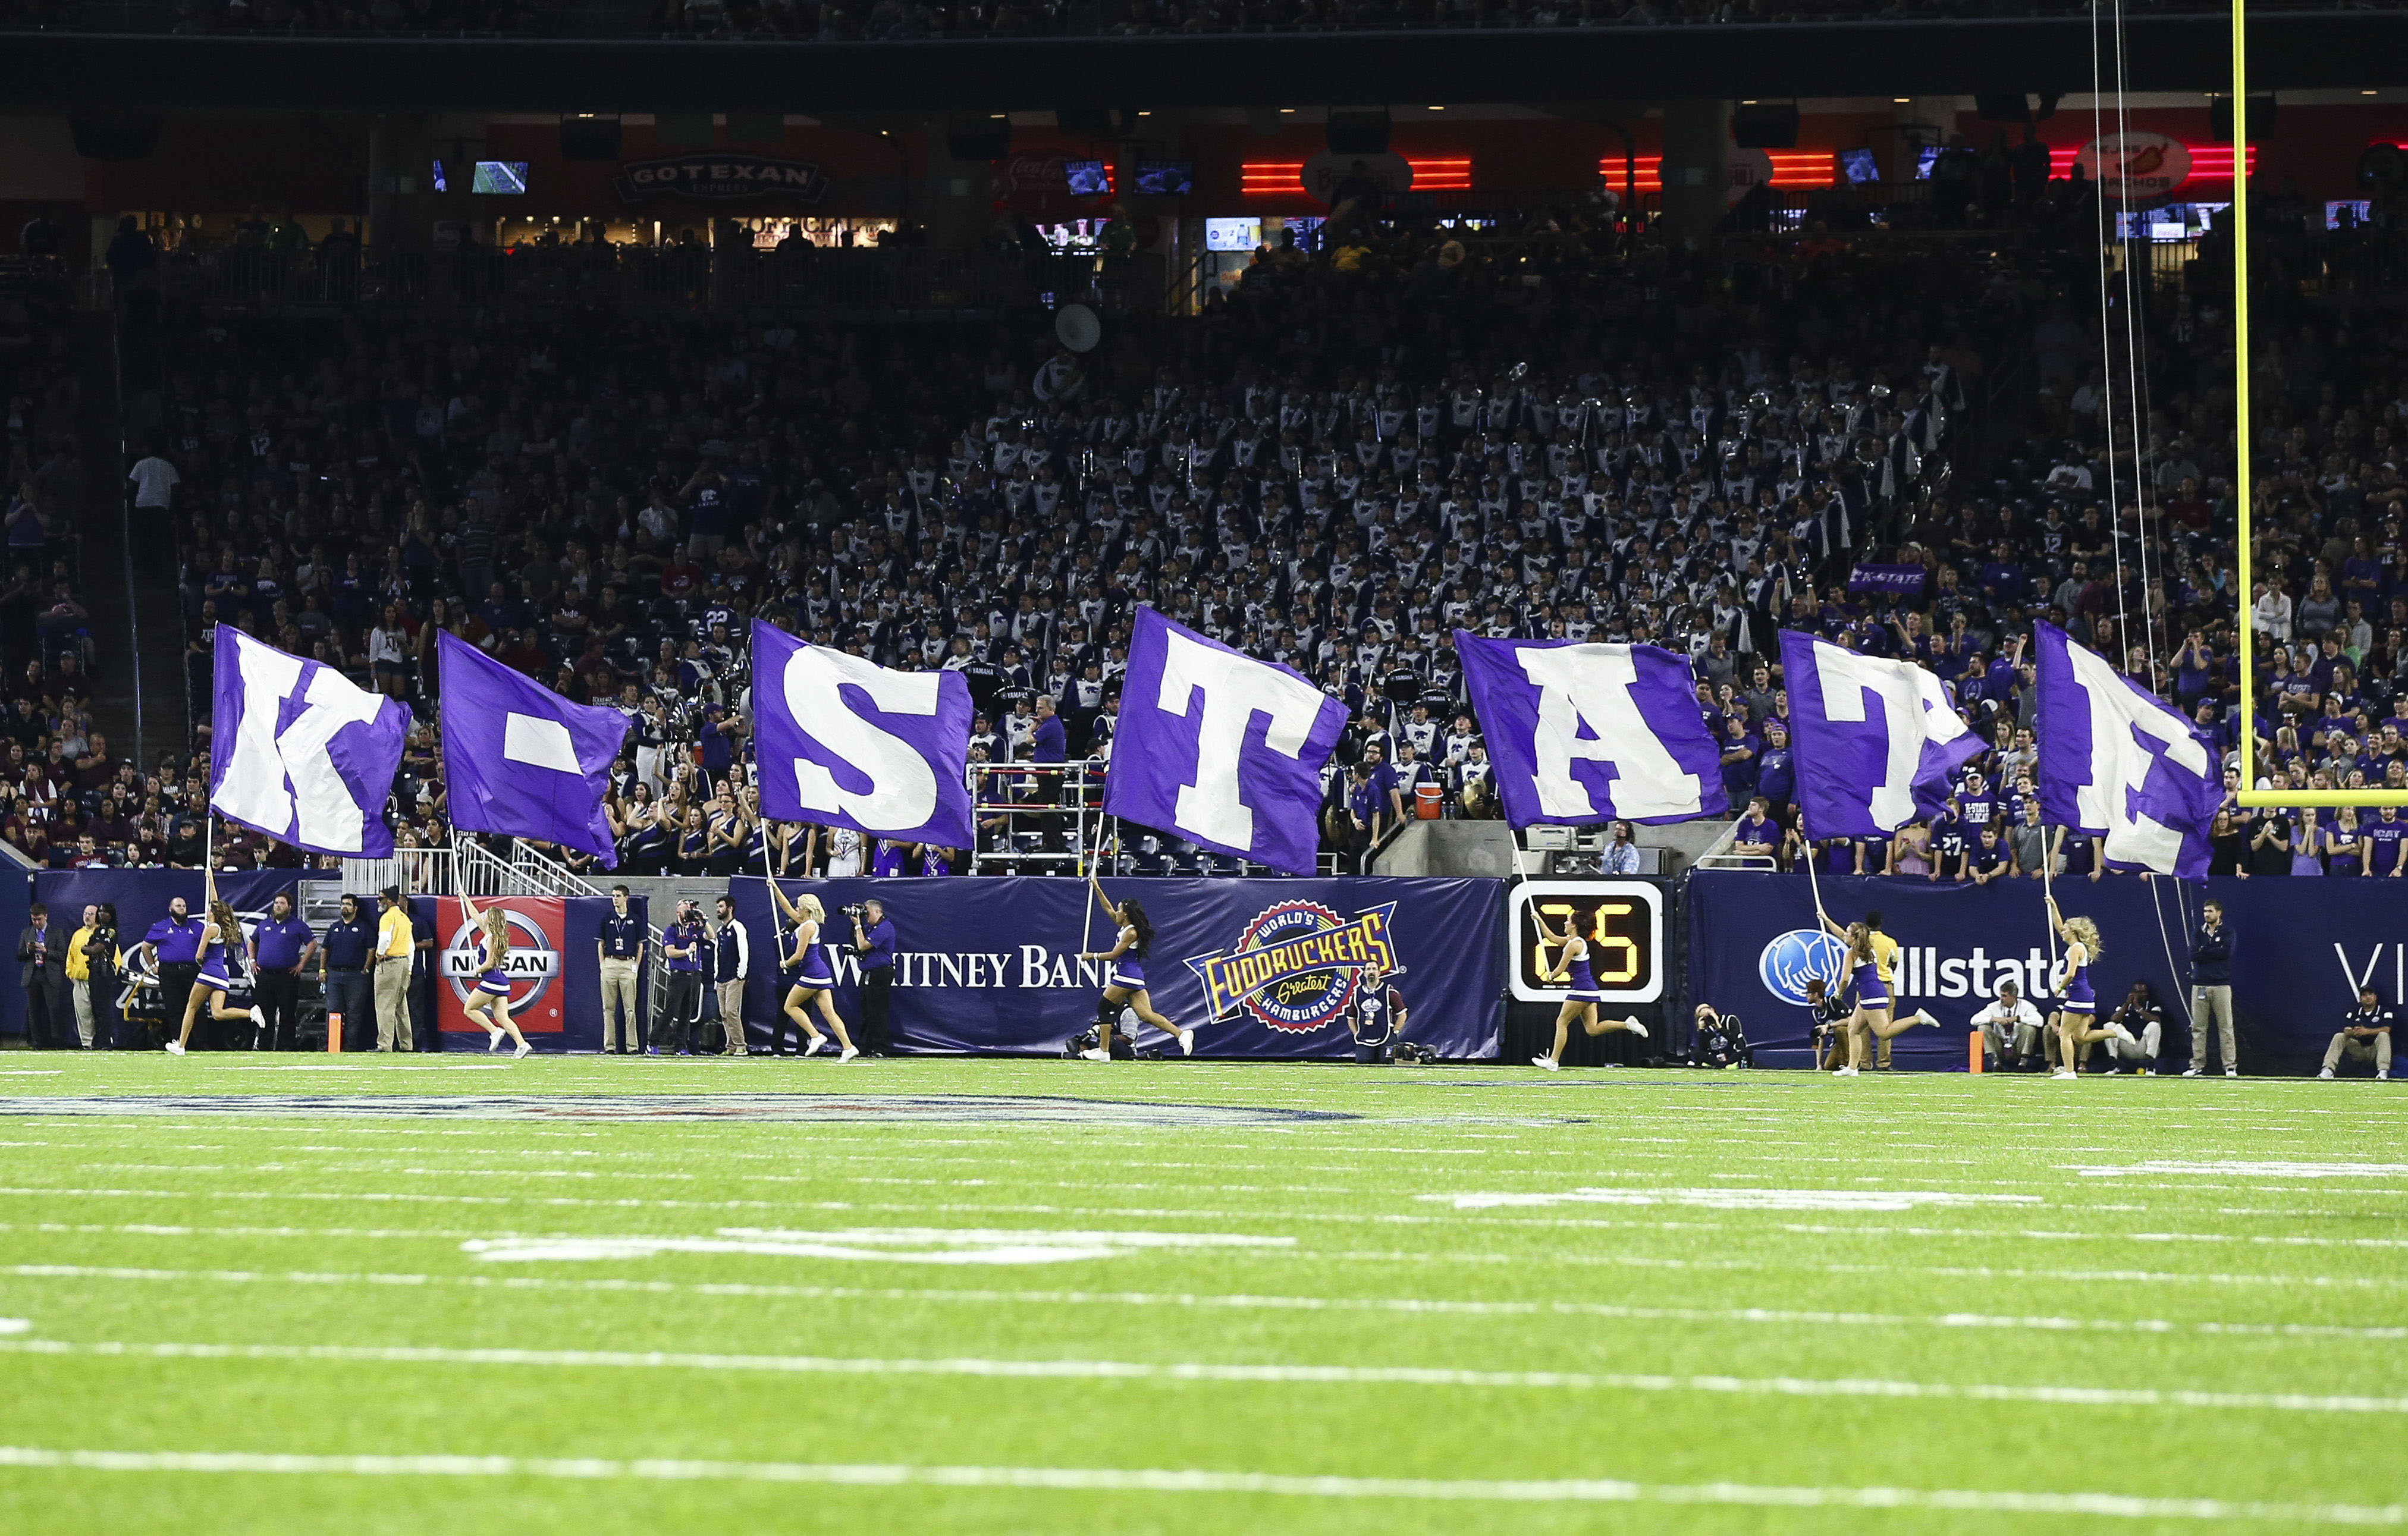 9773574-ncaa-football-texas-bowl-kansas-state-vs-texas-aampampm